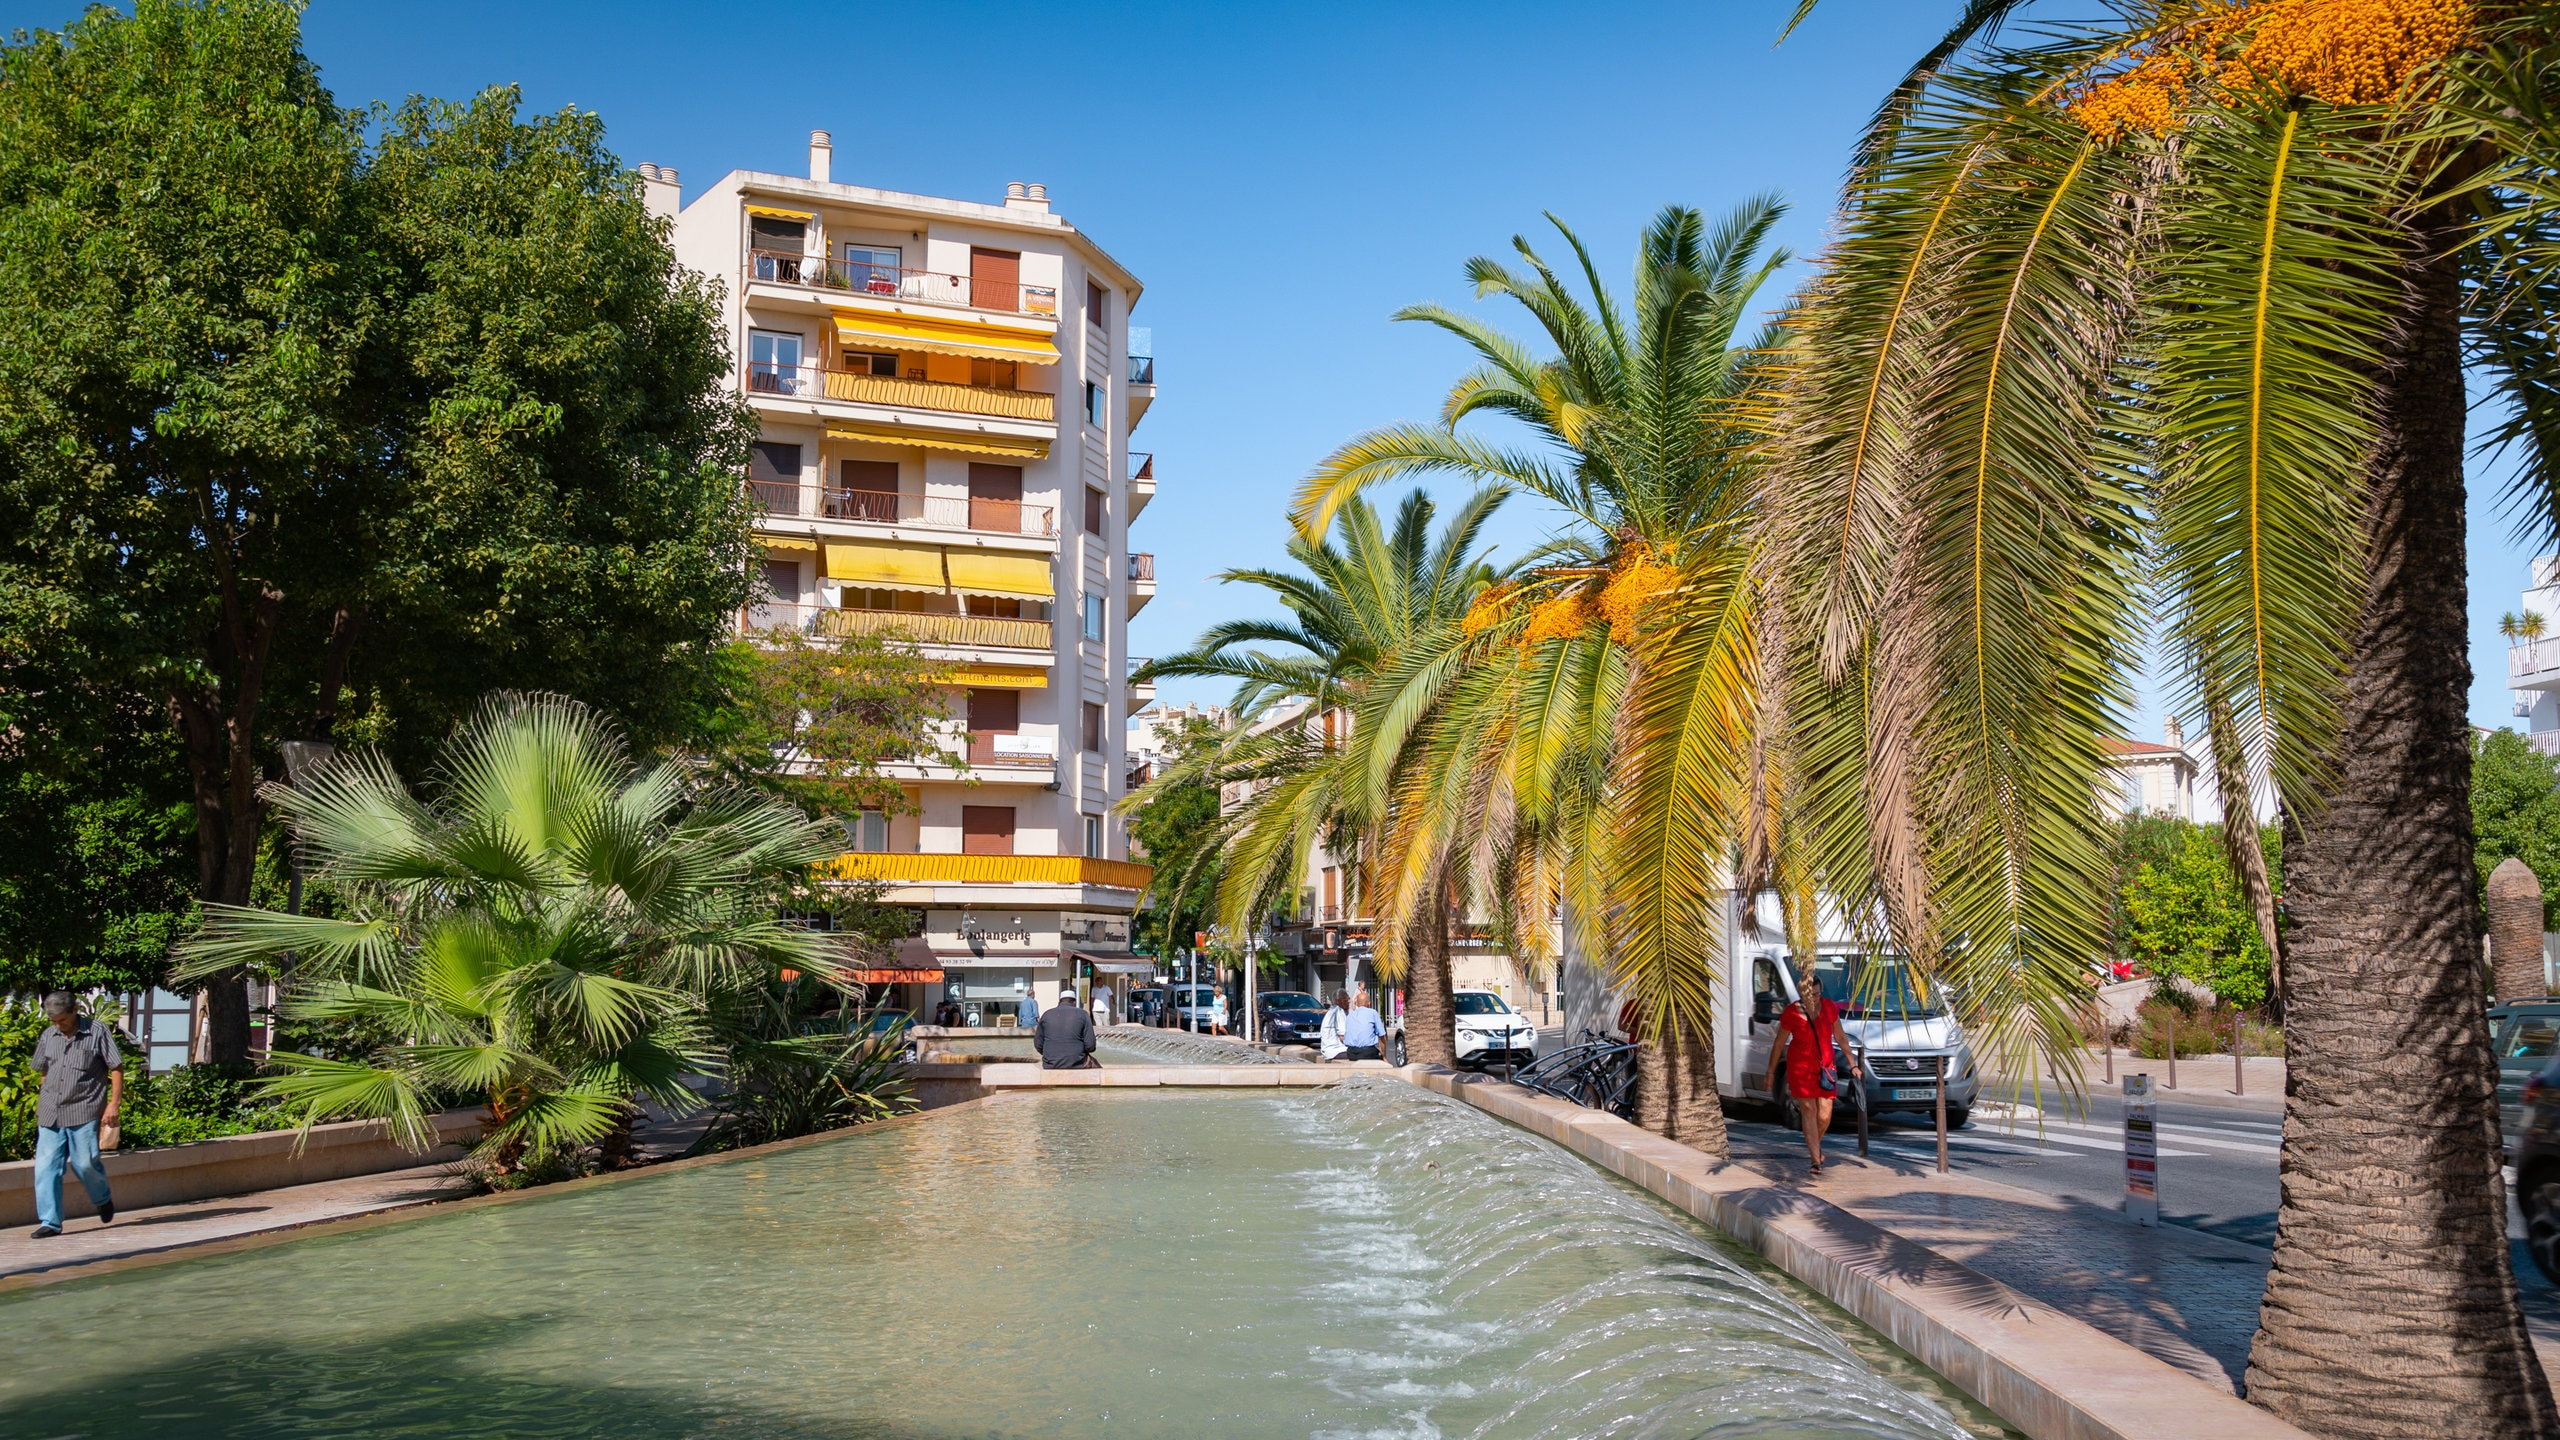 Prado - Republique, Cannes, Alpes-Maritimes, France